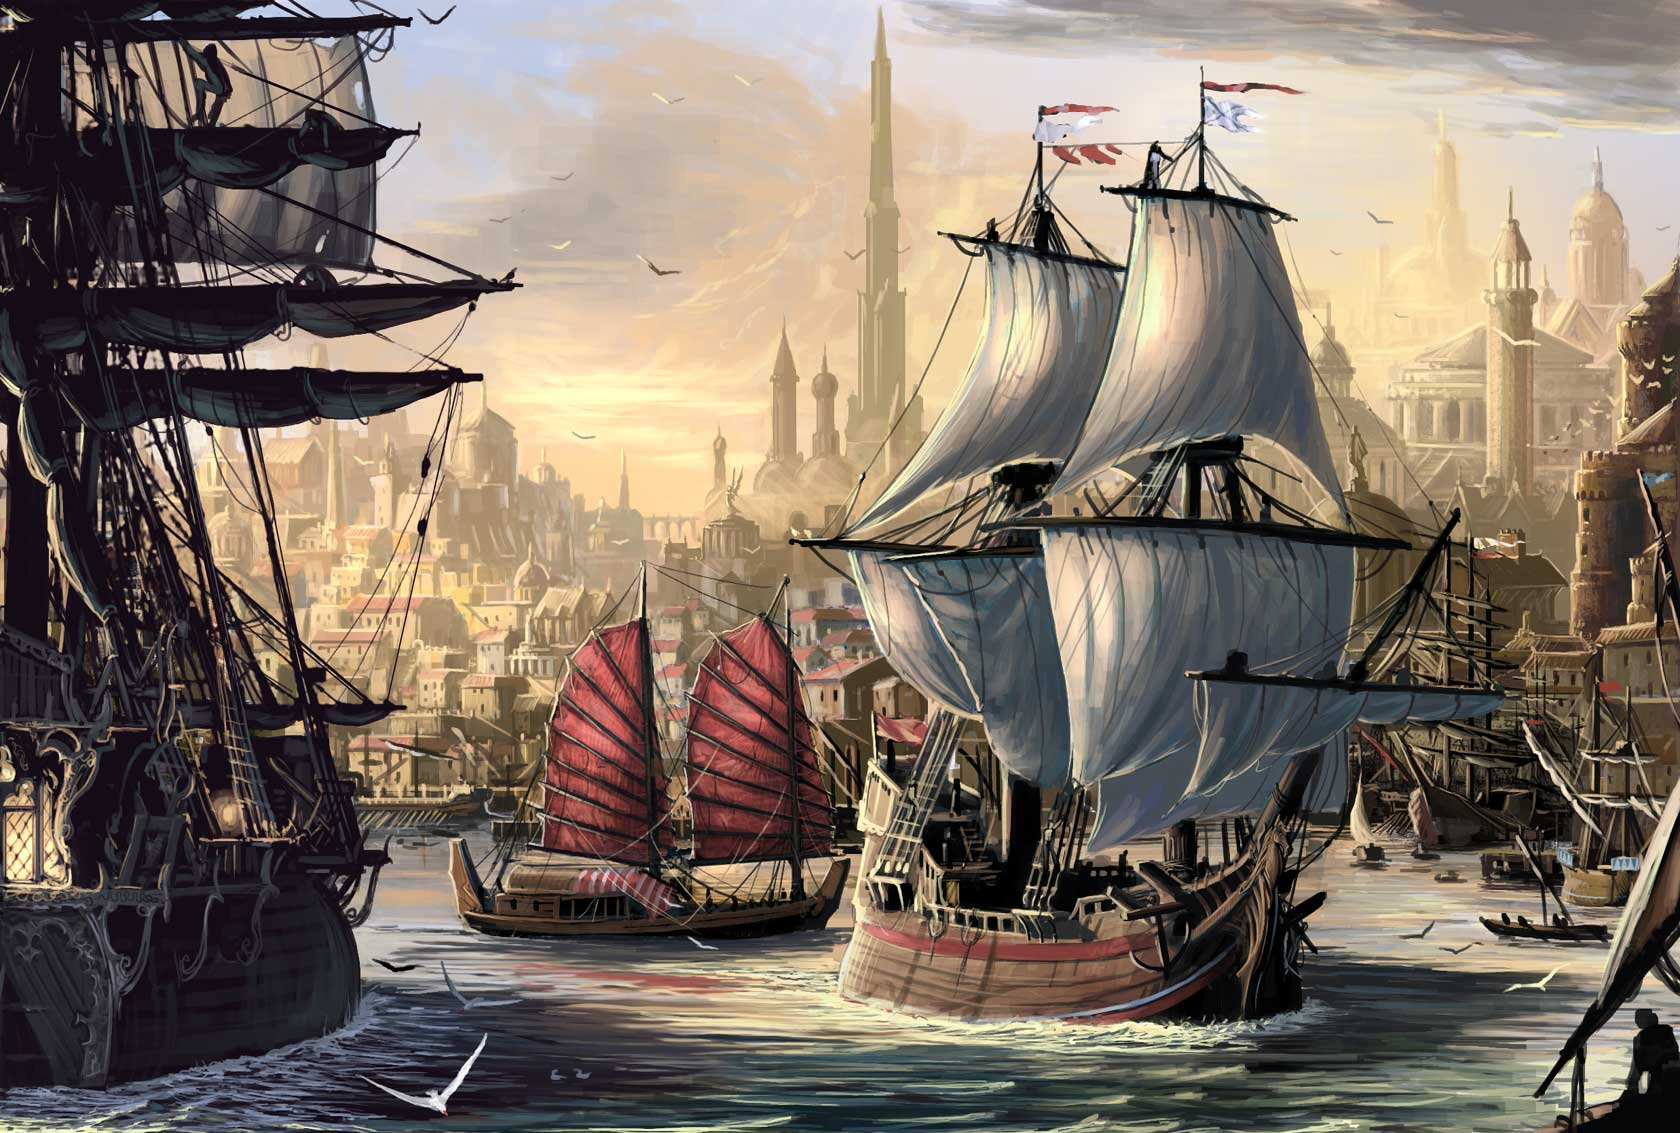 10.port et capitainerie